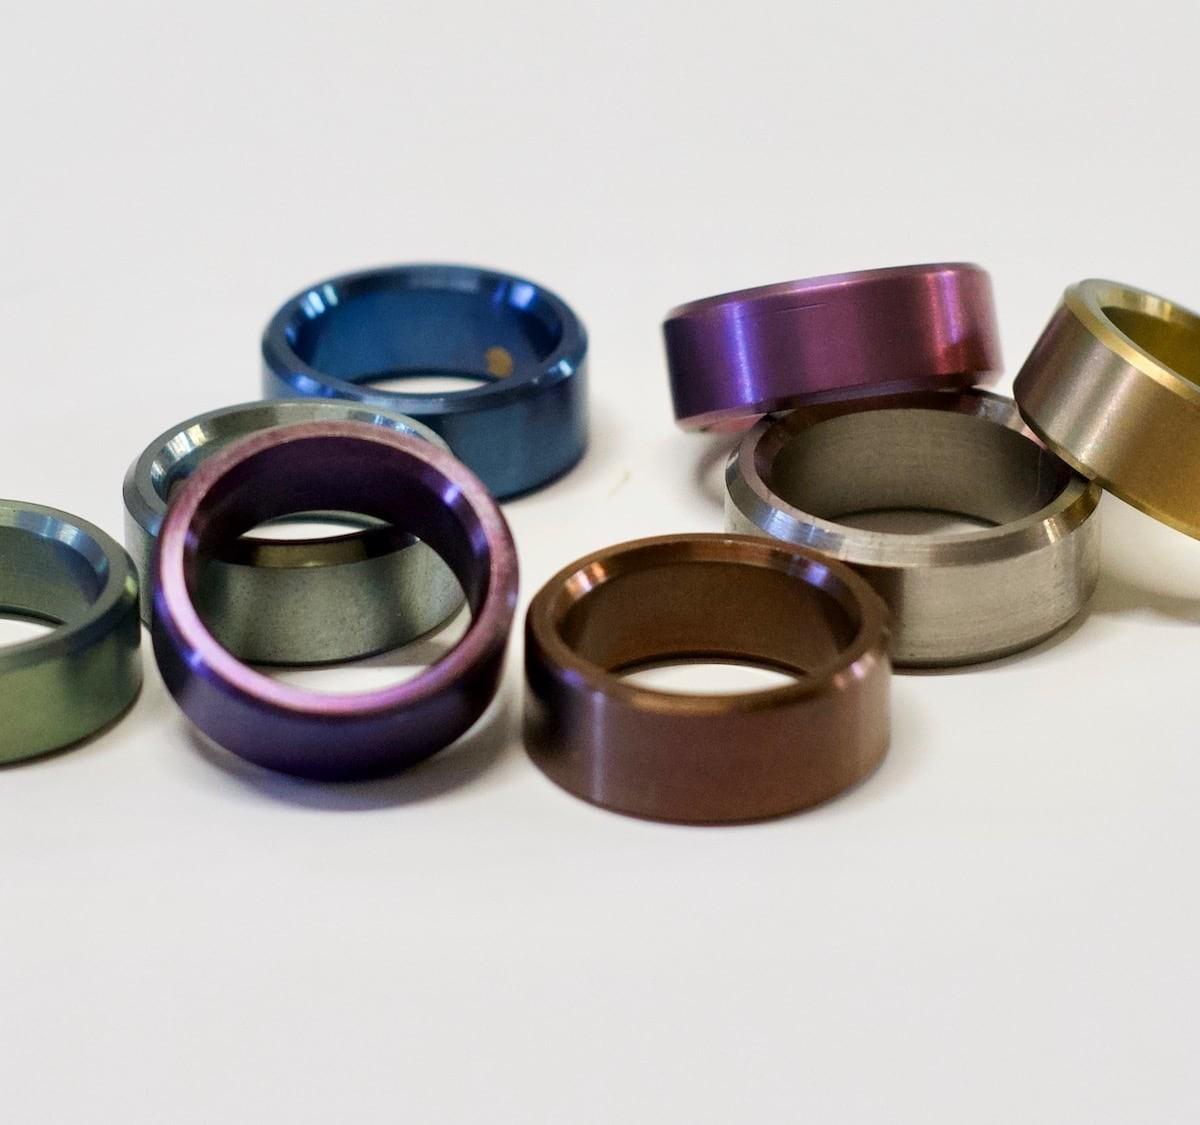 Oracle colorful titanium rings are simple but so unique